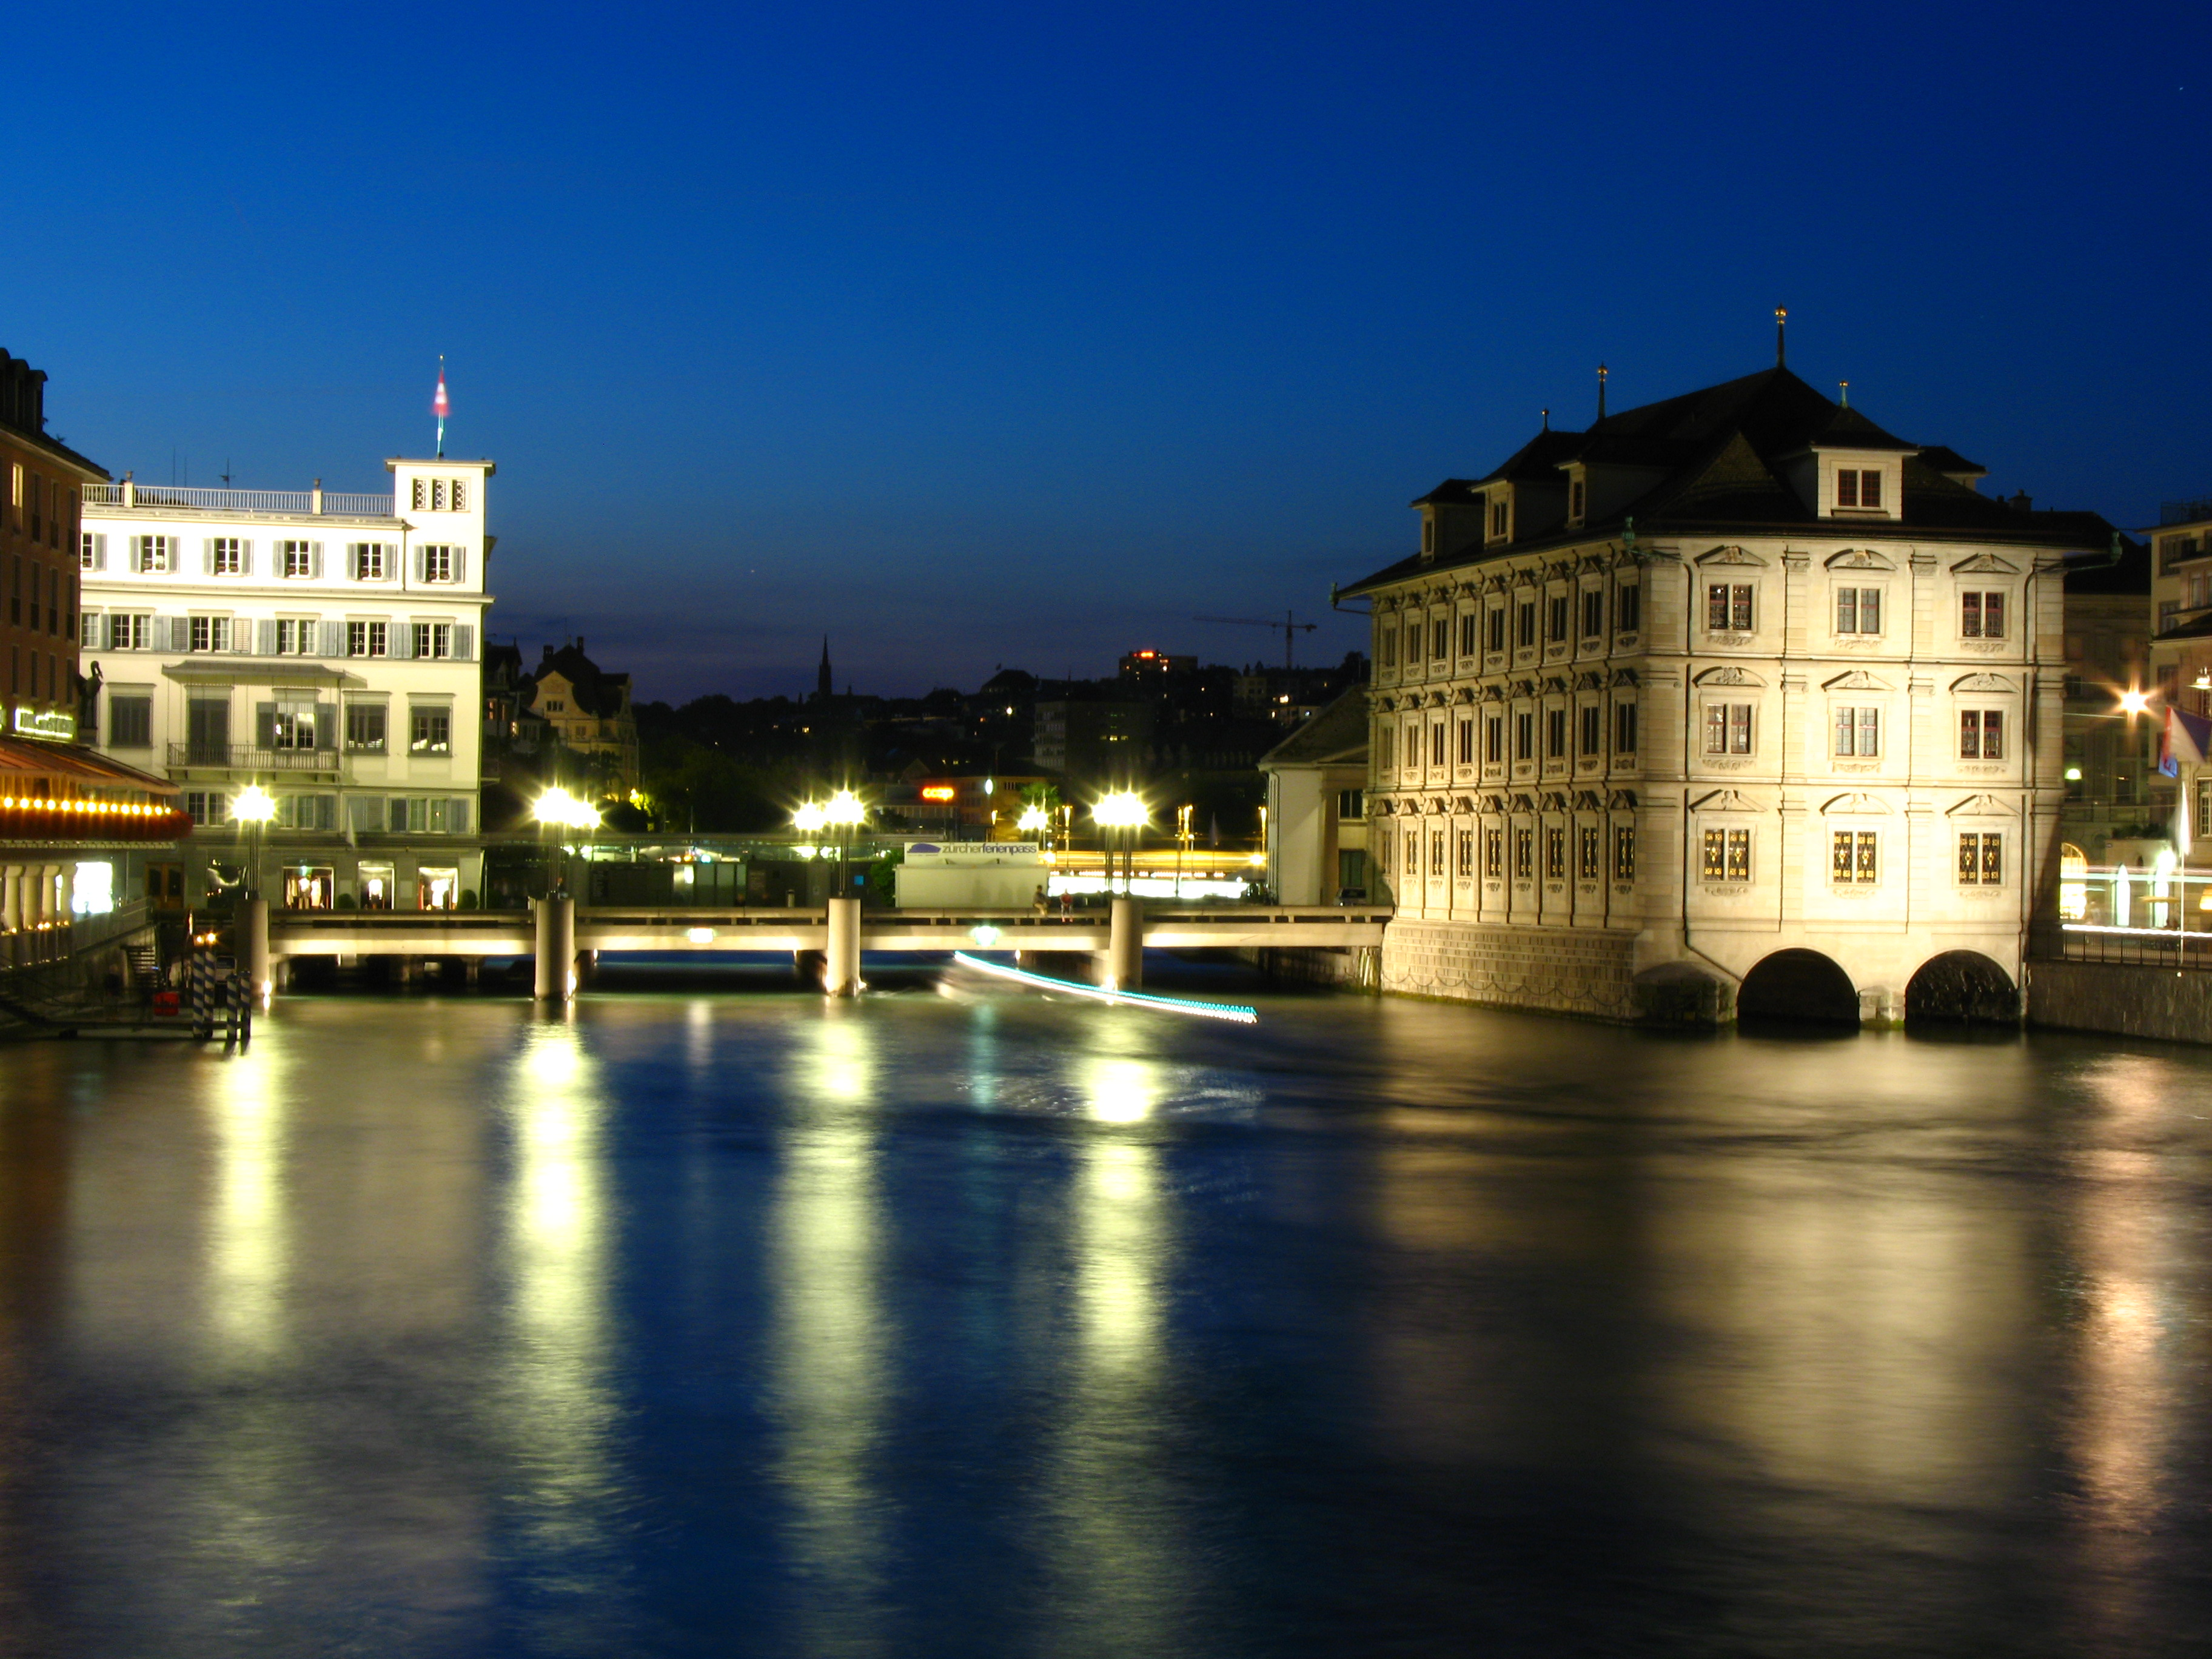 File:7507 - Zürich - Rathausbrücke.JPG - Wikimedia Commons